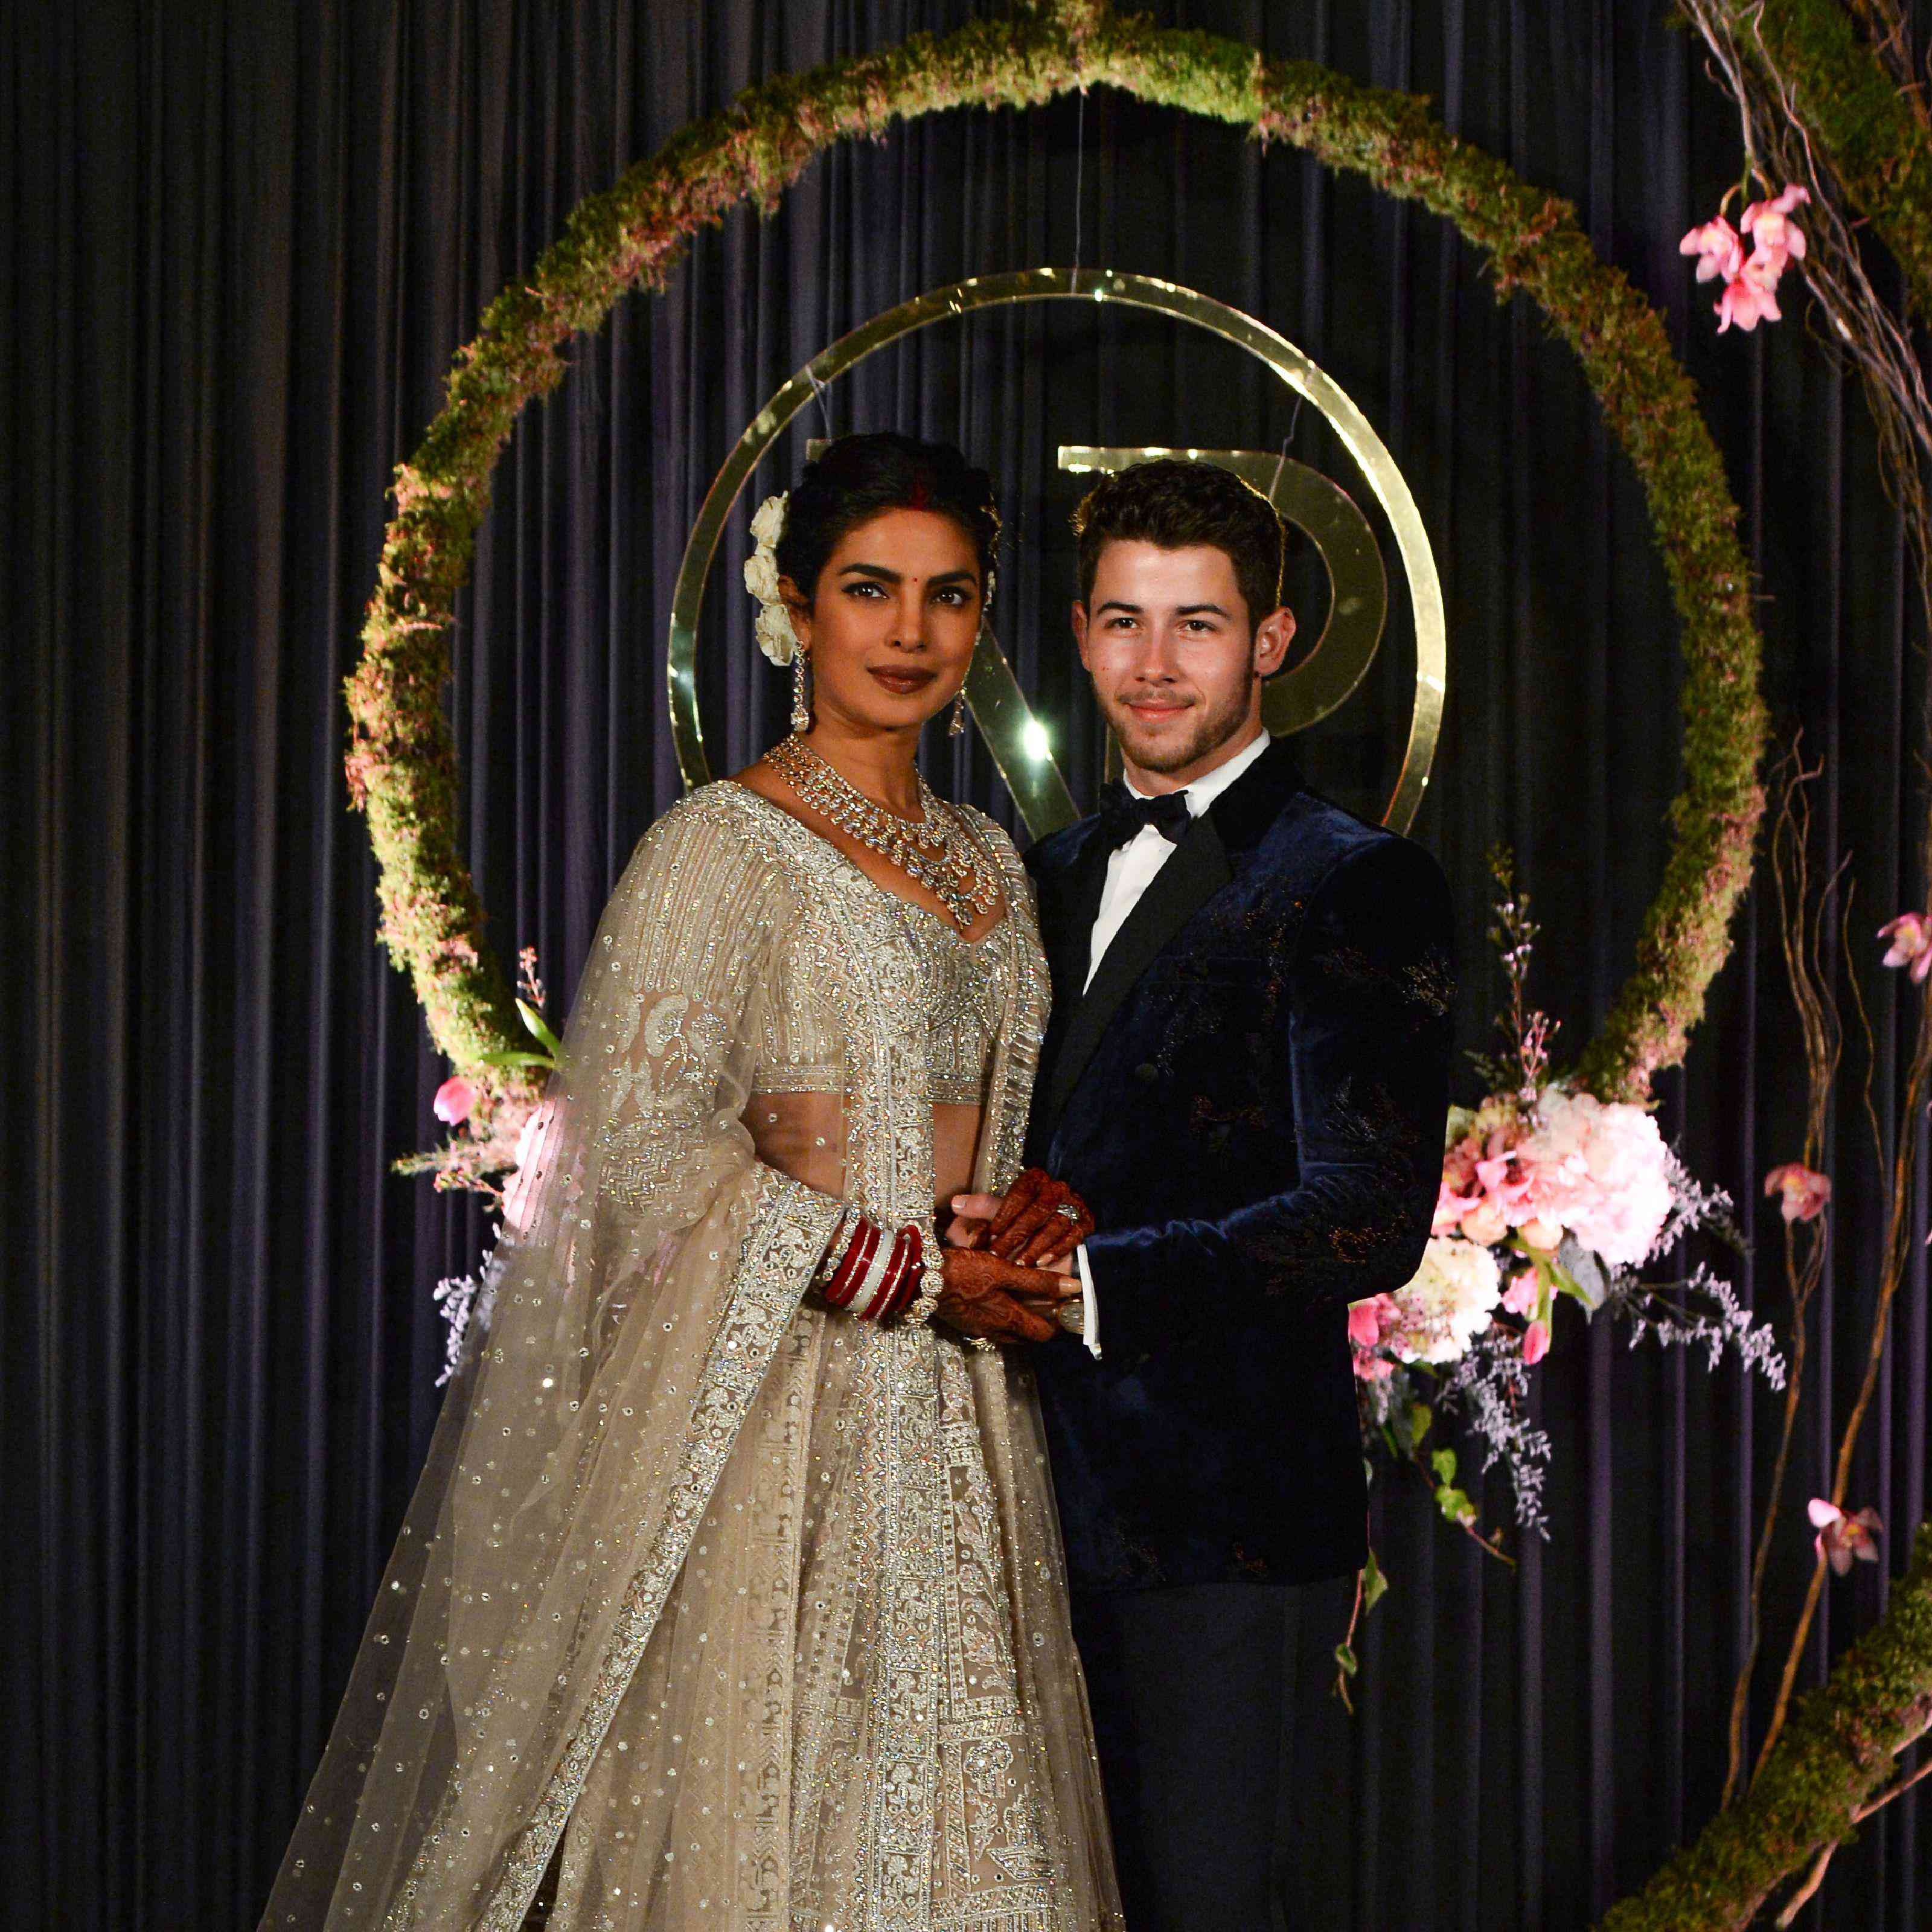 Priyanka Wedding White Gown: All The Details On Priyanka Chopra's Two Wedding Dresses